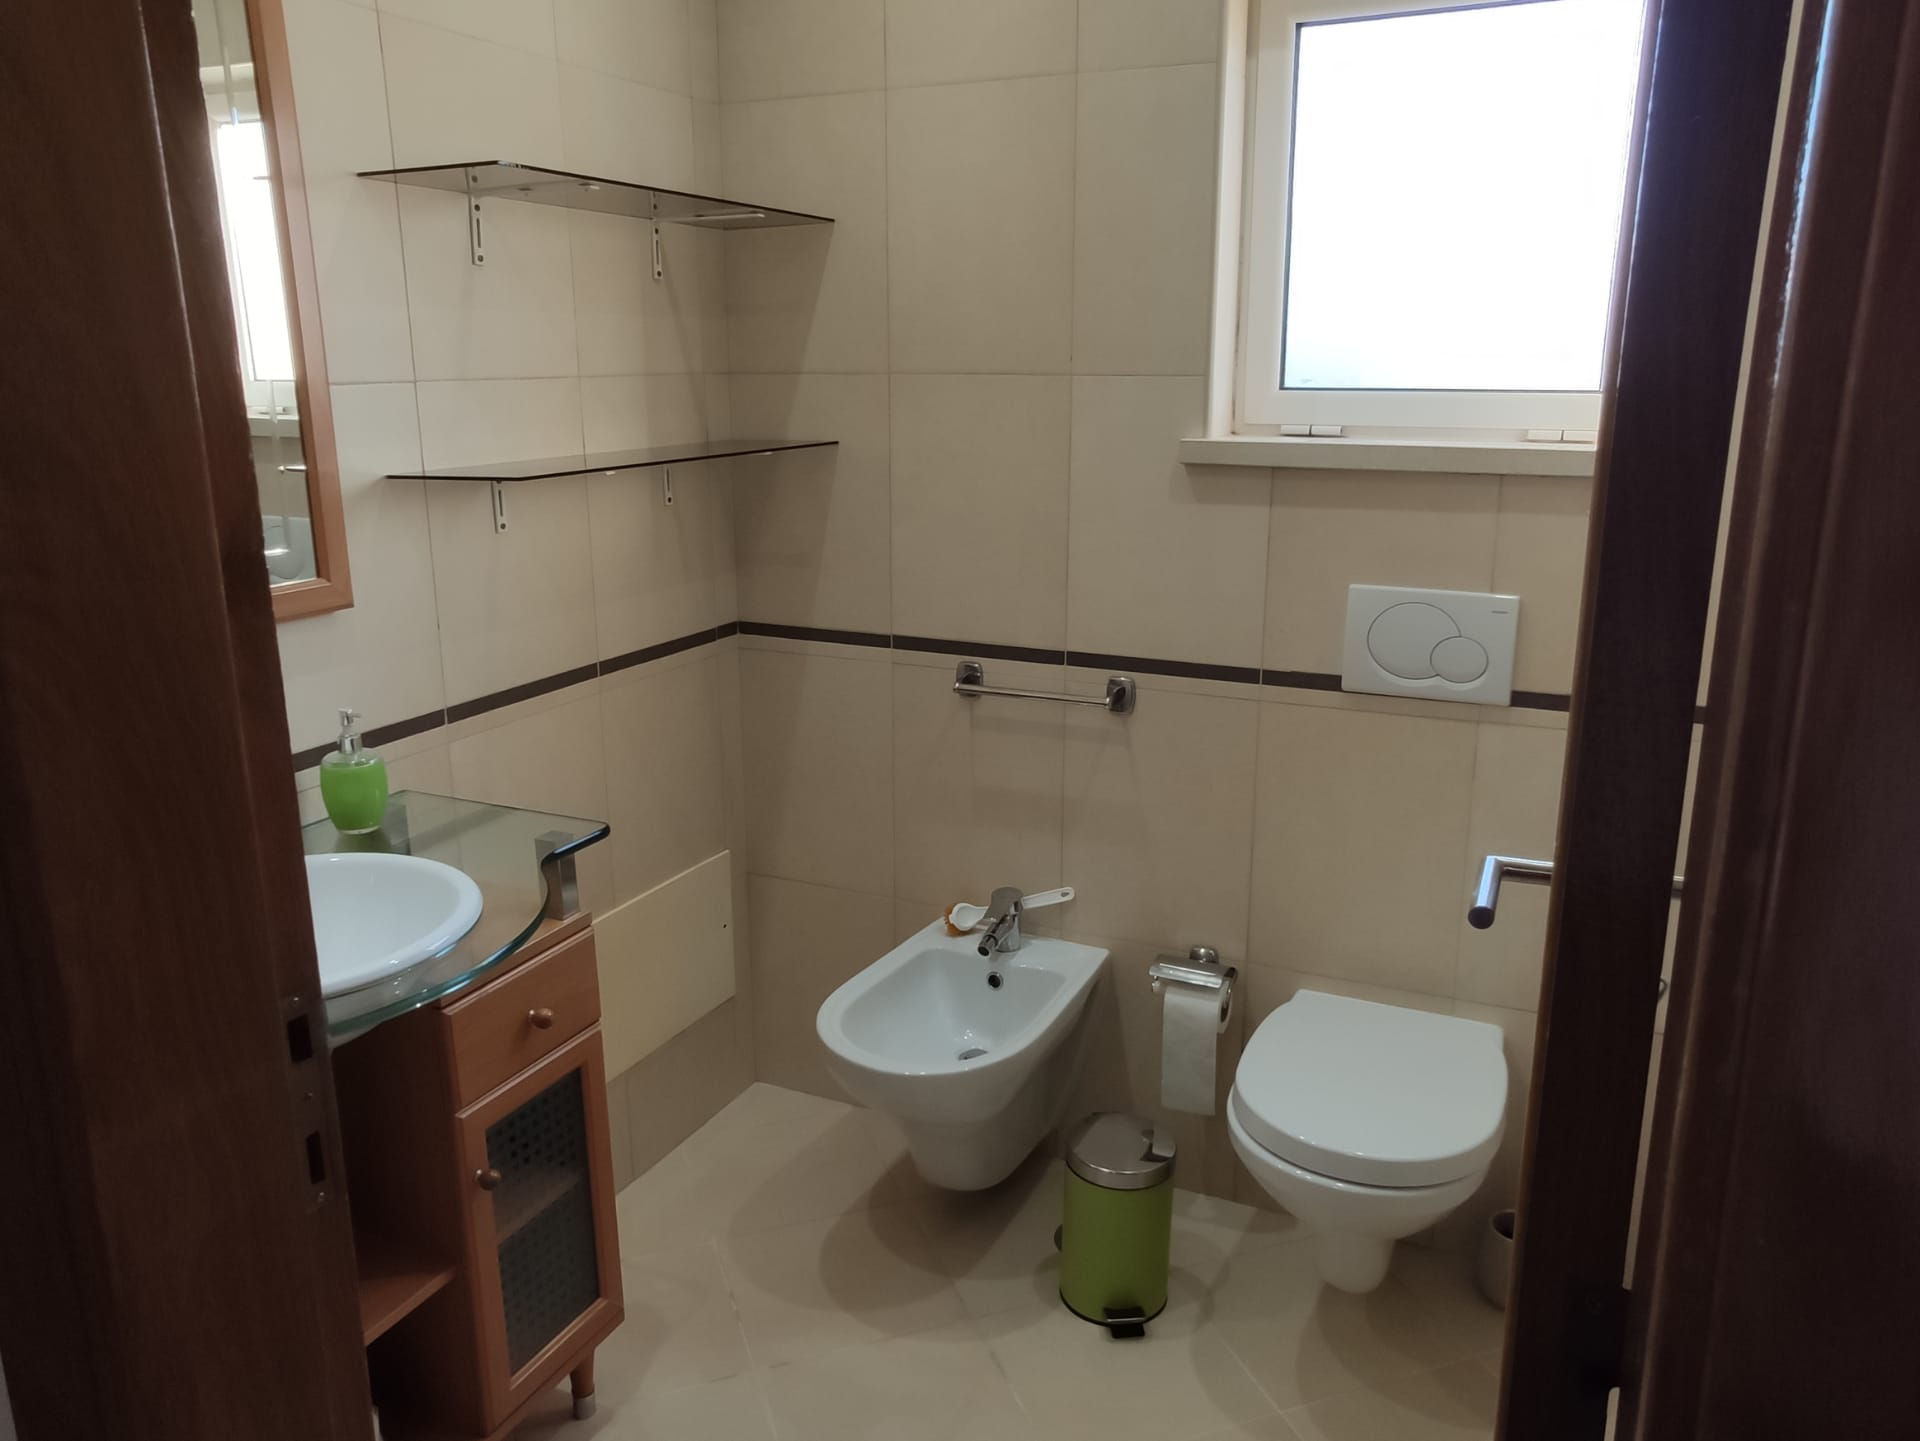 Apartamentos e moradias para alugar, Airport Apartament in Faro em Faro, Portugal Algarve, REF_IMG_13896_13906